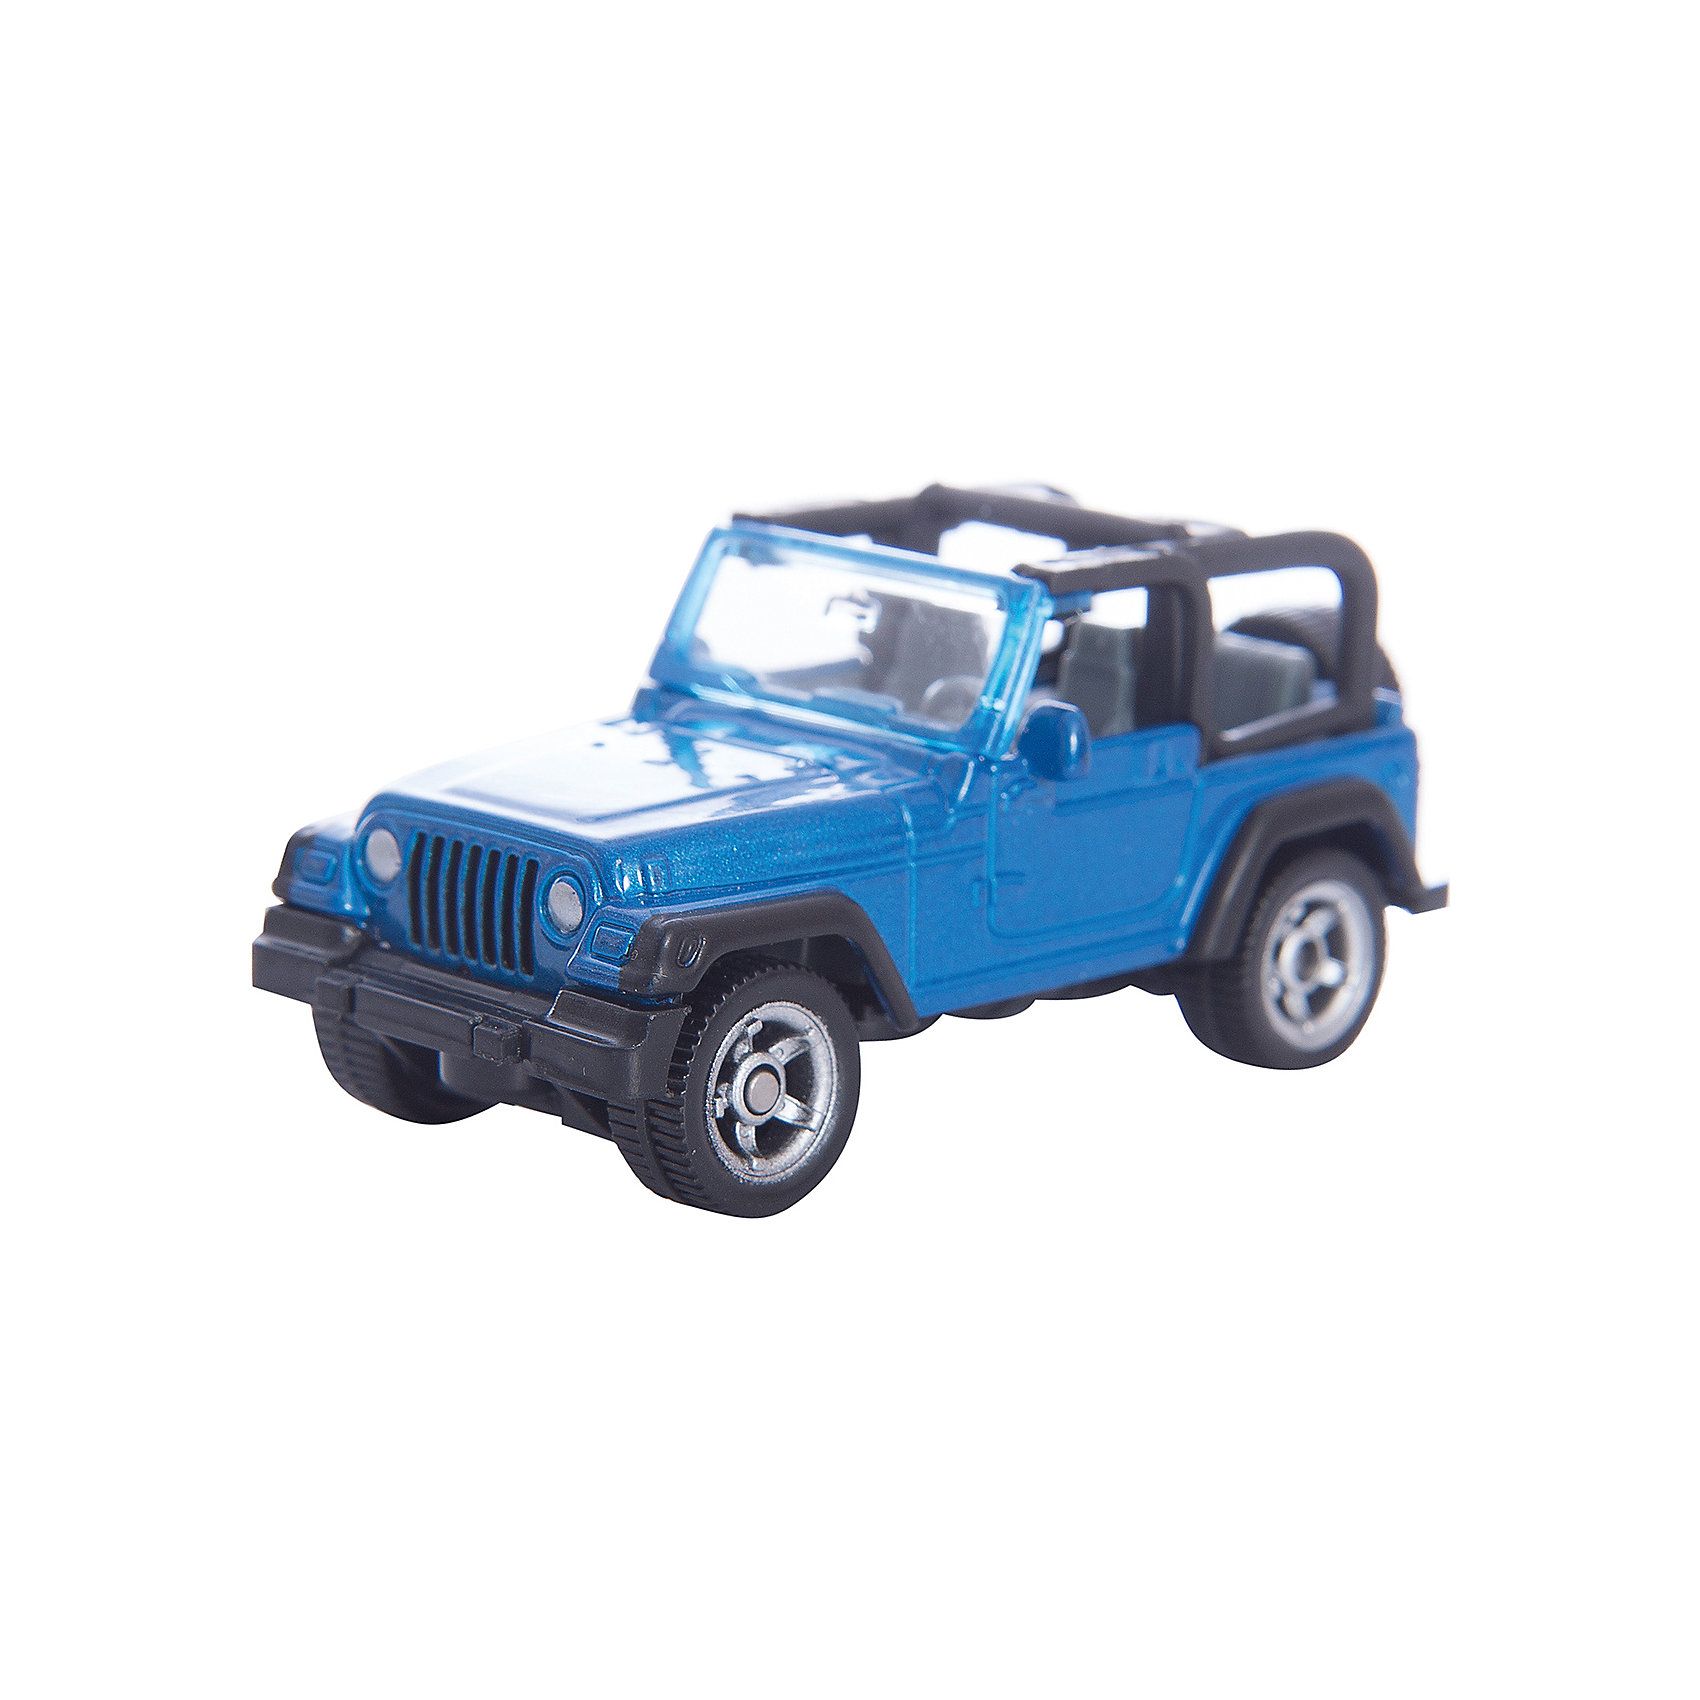 SIKU SIKU 1342 Jeep Wrangler siku внедорожник jeep wrangler с прицепом для перевозки лошадей